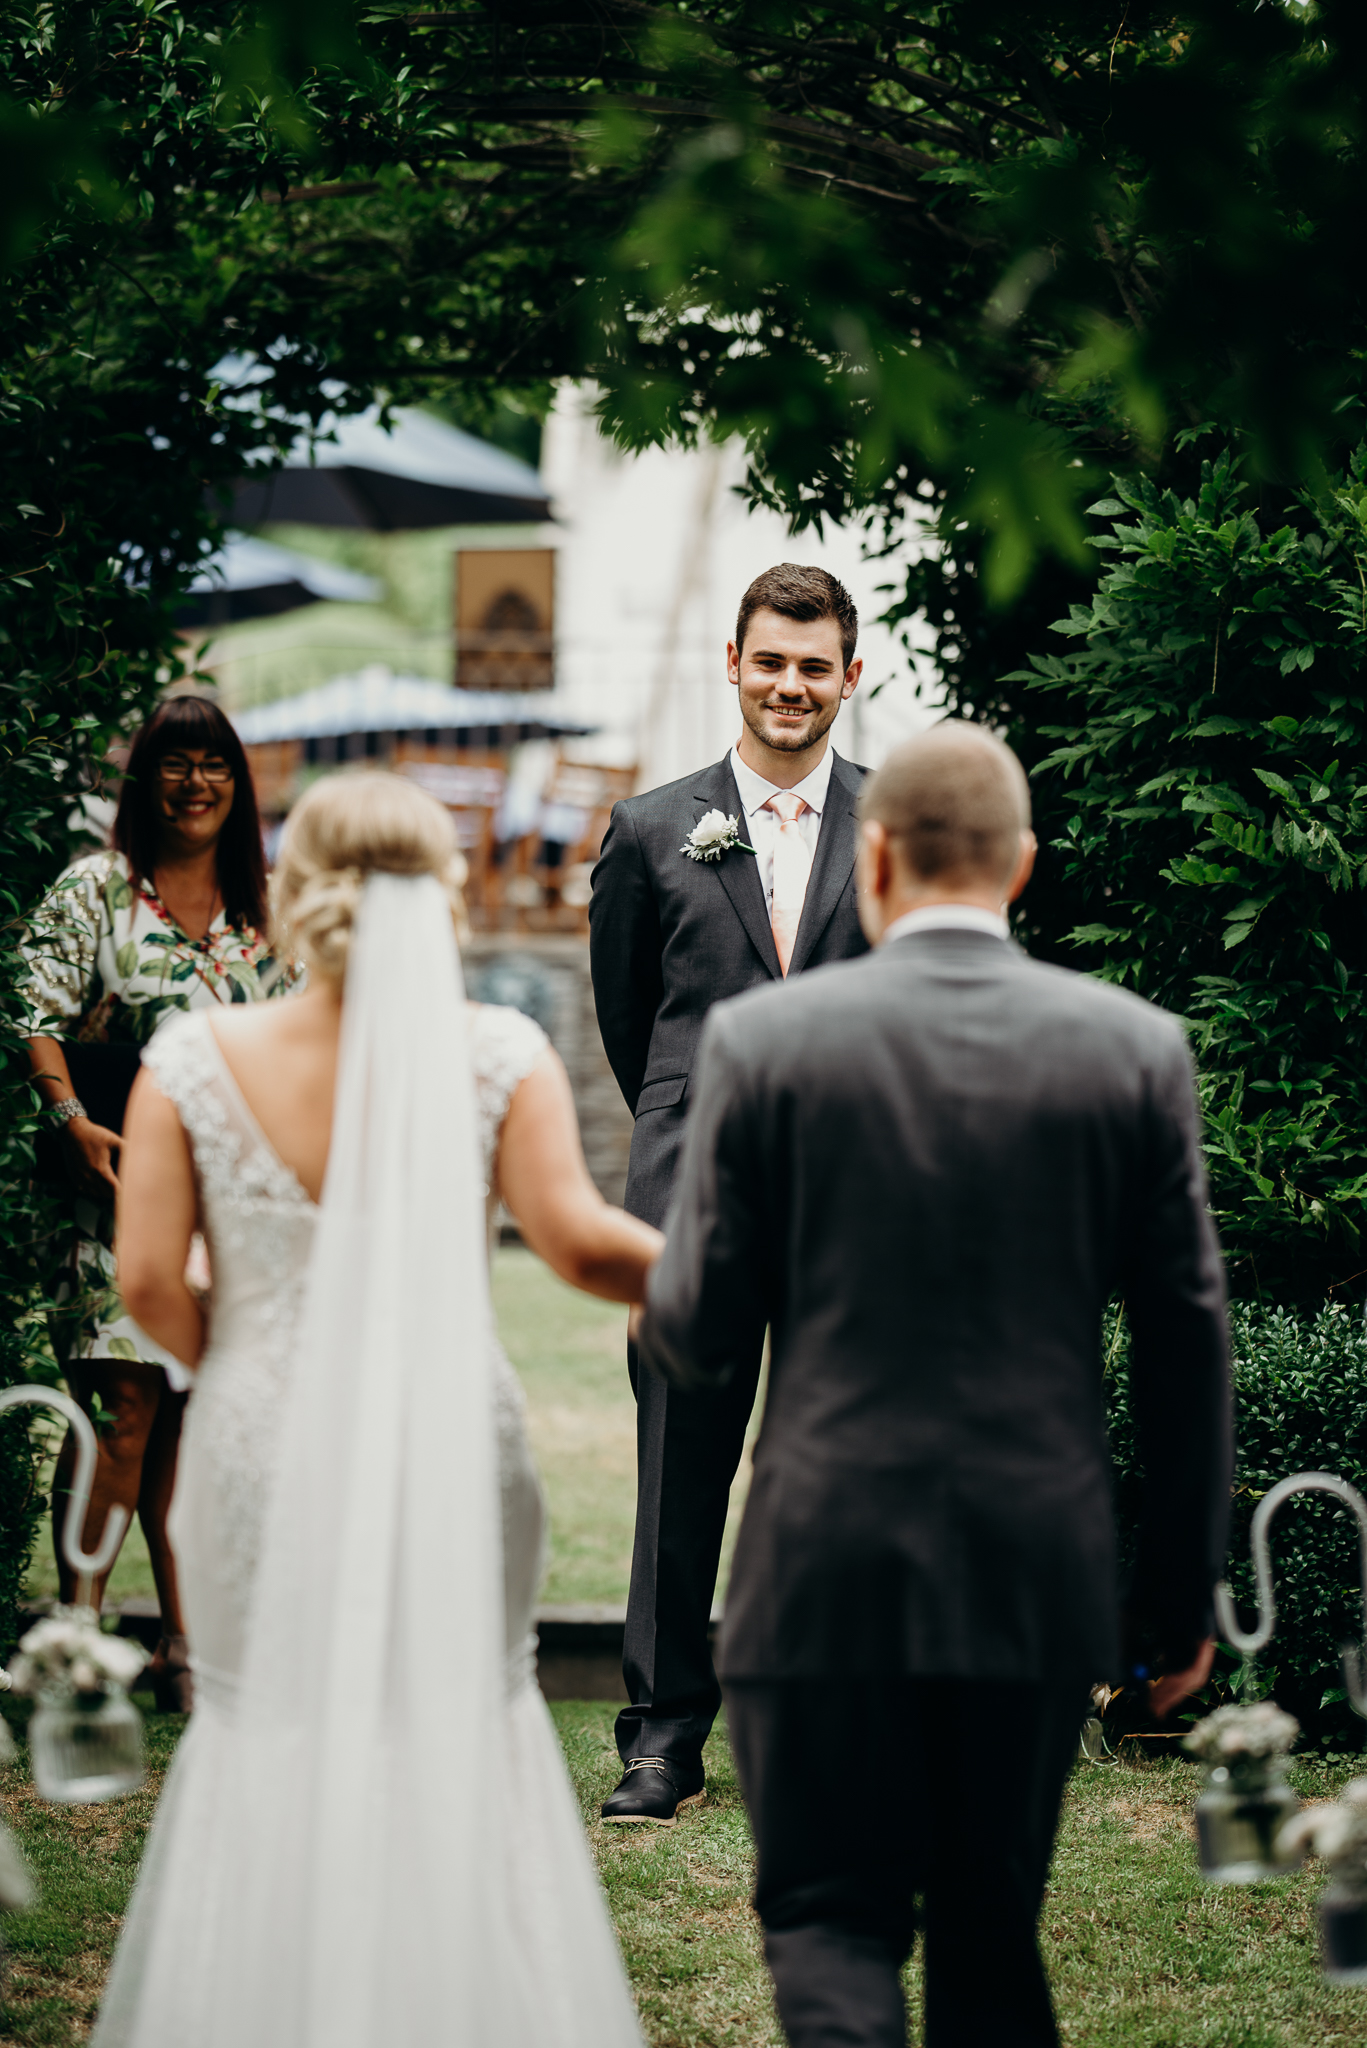 Tauranga-Coromandel-Elegant-Wedding-Photographer-Charlemagne-Lodge-63.jpg